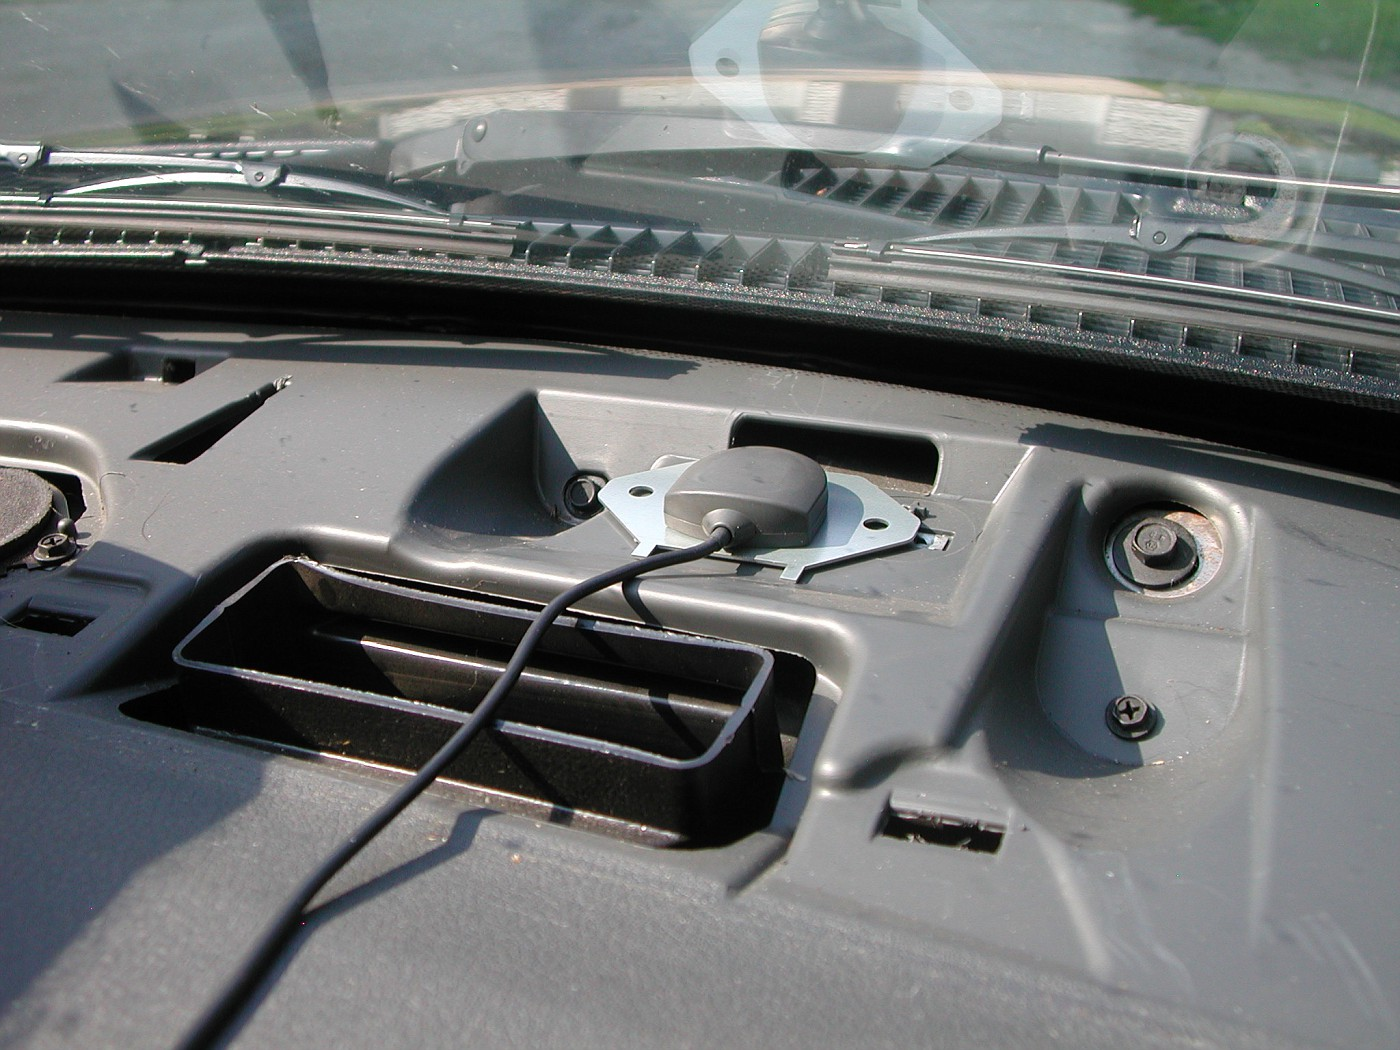 95 Jeep Cherokee Fuse Box 2004 Hyundai Sonata Wiring Diagram 2005 Jeep